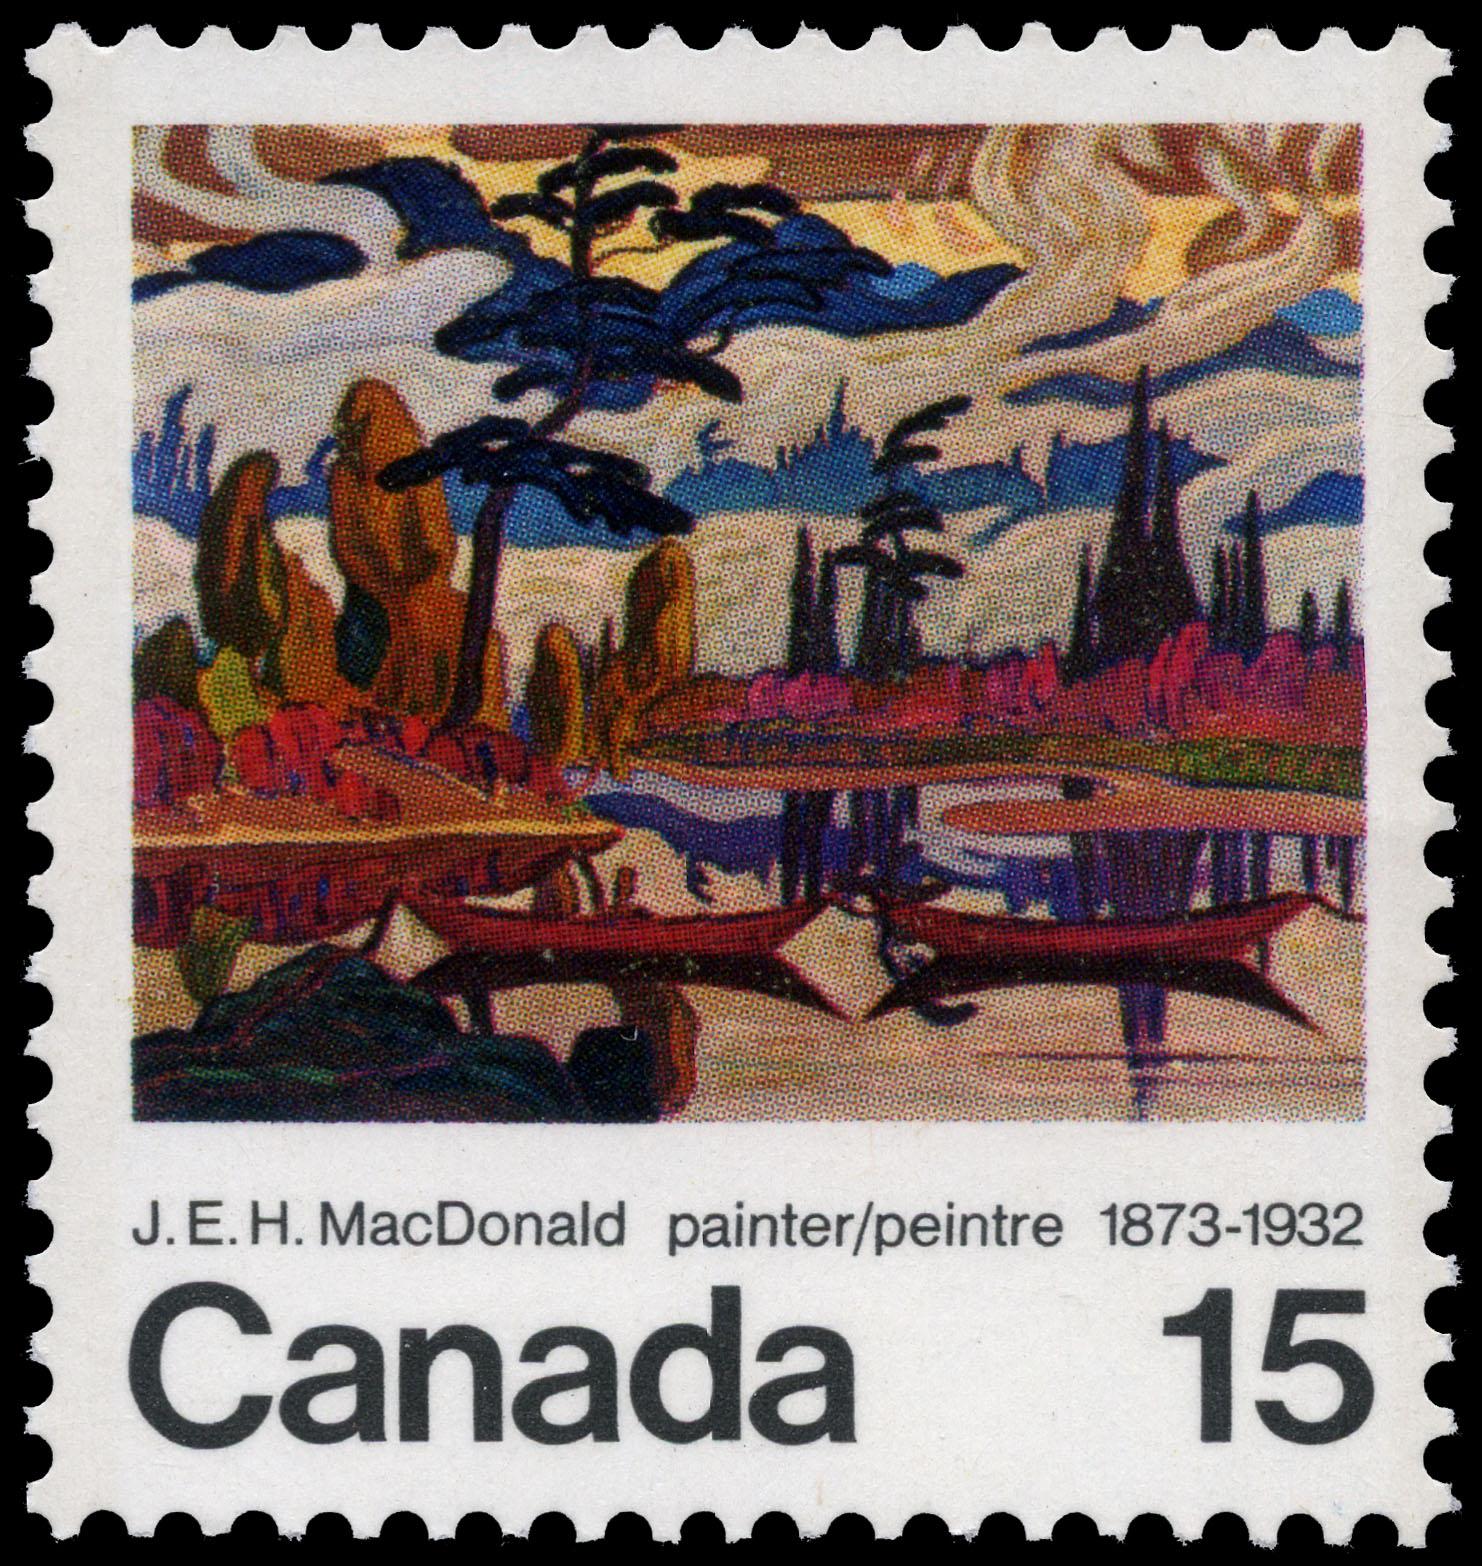 J.E.H. MacDonald, painter, 1873-1932 Canada Postage Stamp